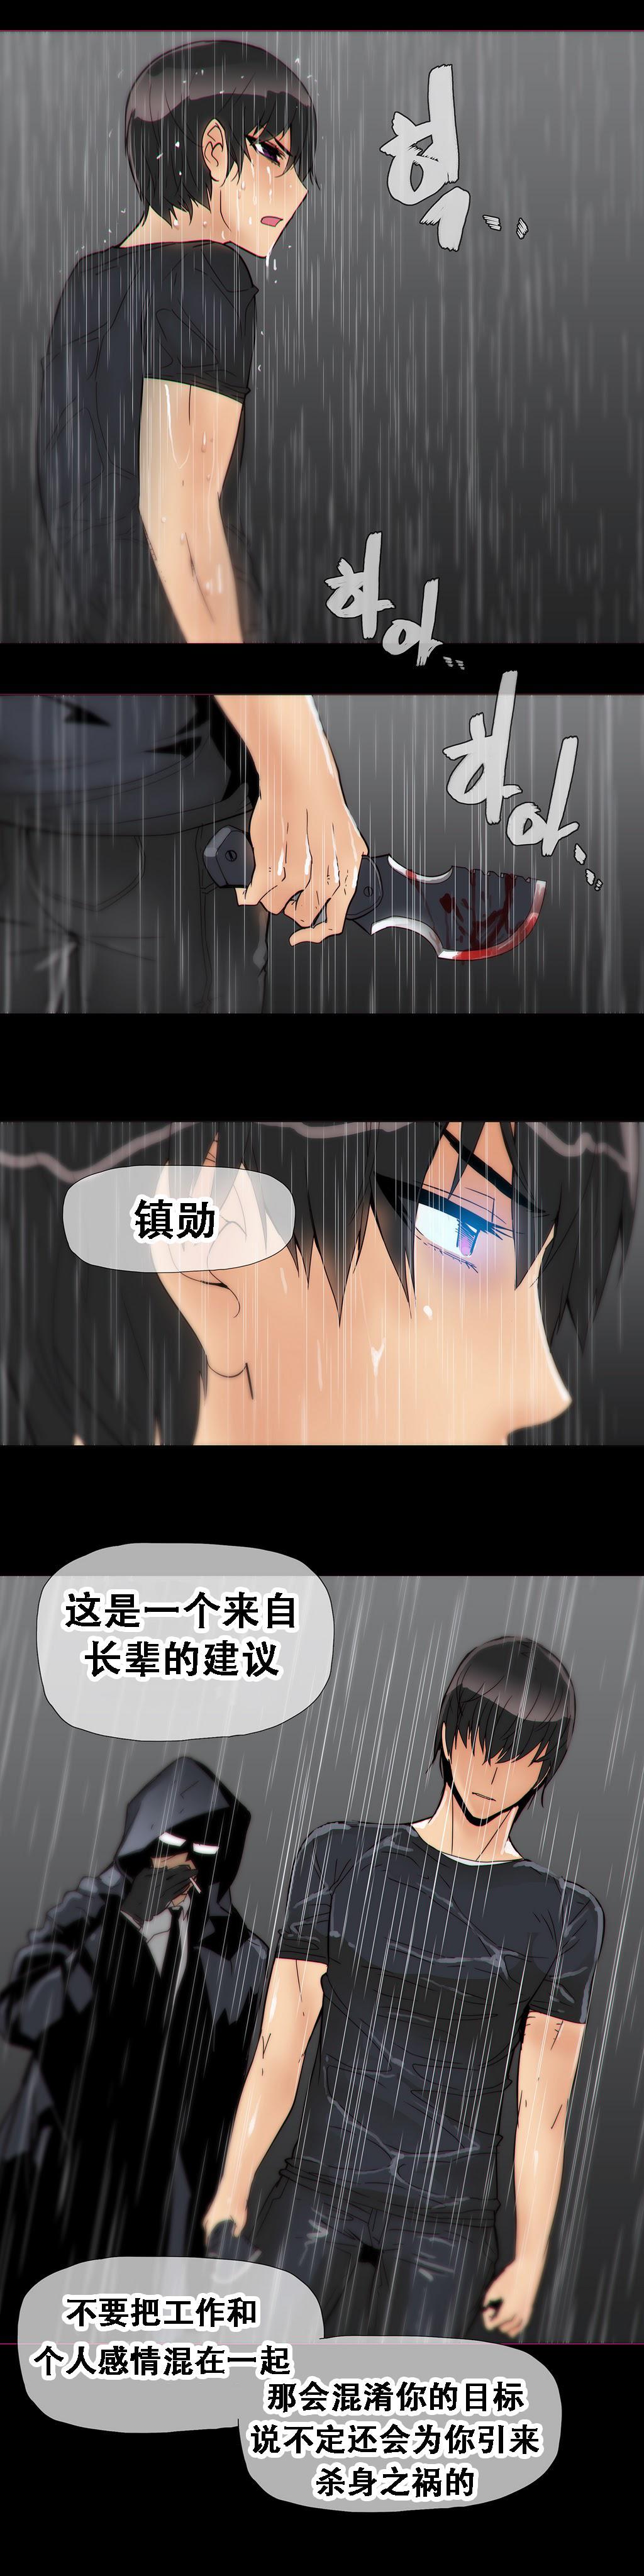 HouseHold Affairs 【卞赤鲤个人汉化】1~21话(持续更新中) 347